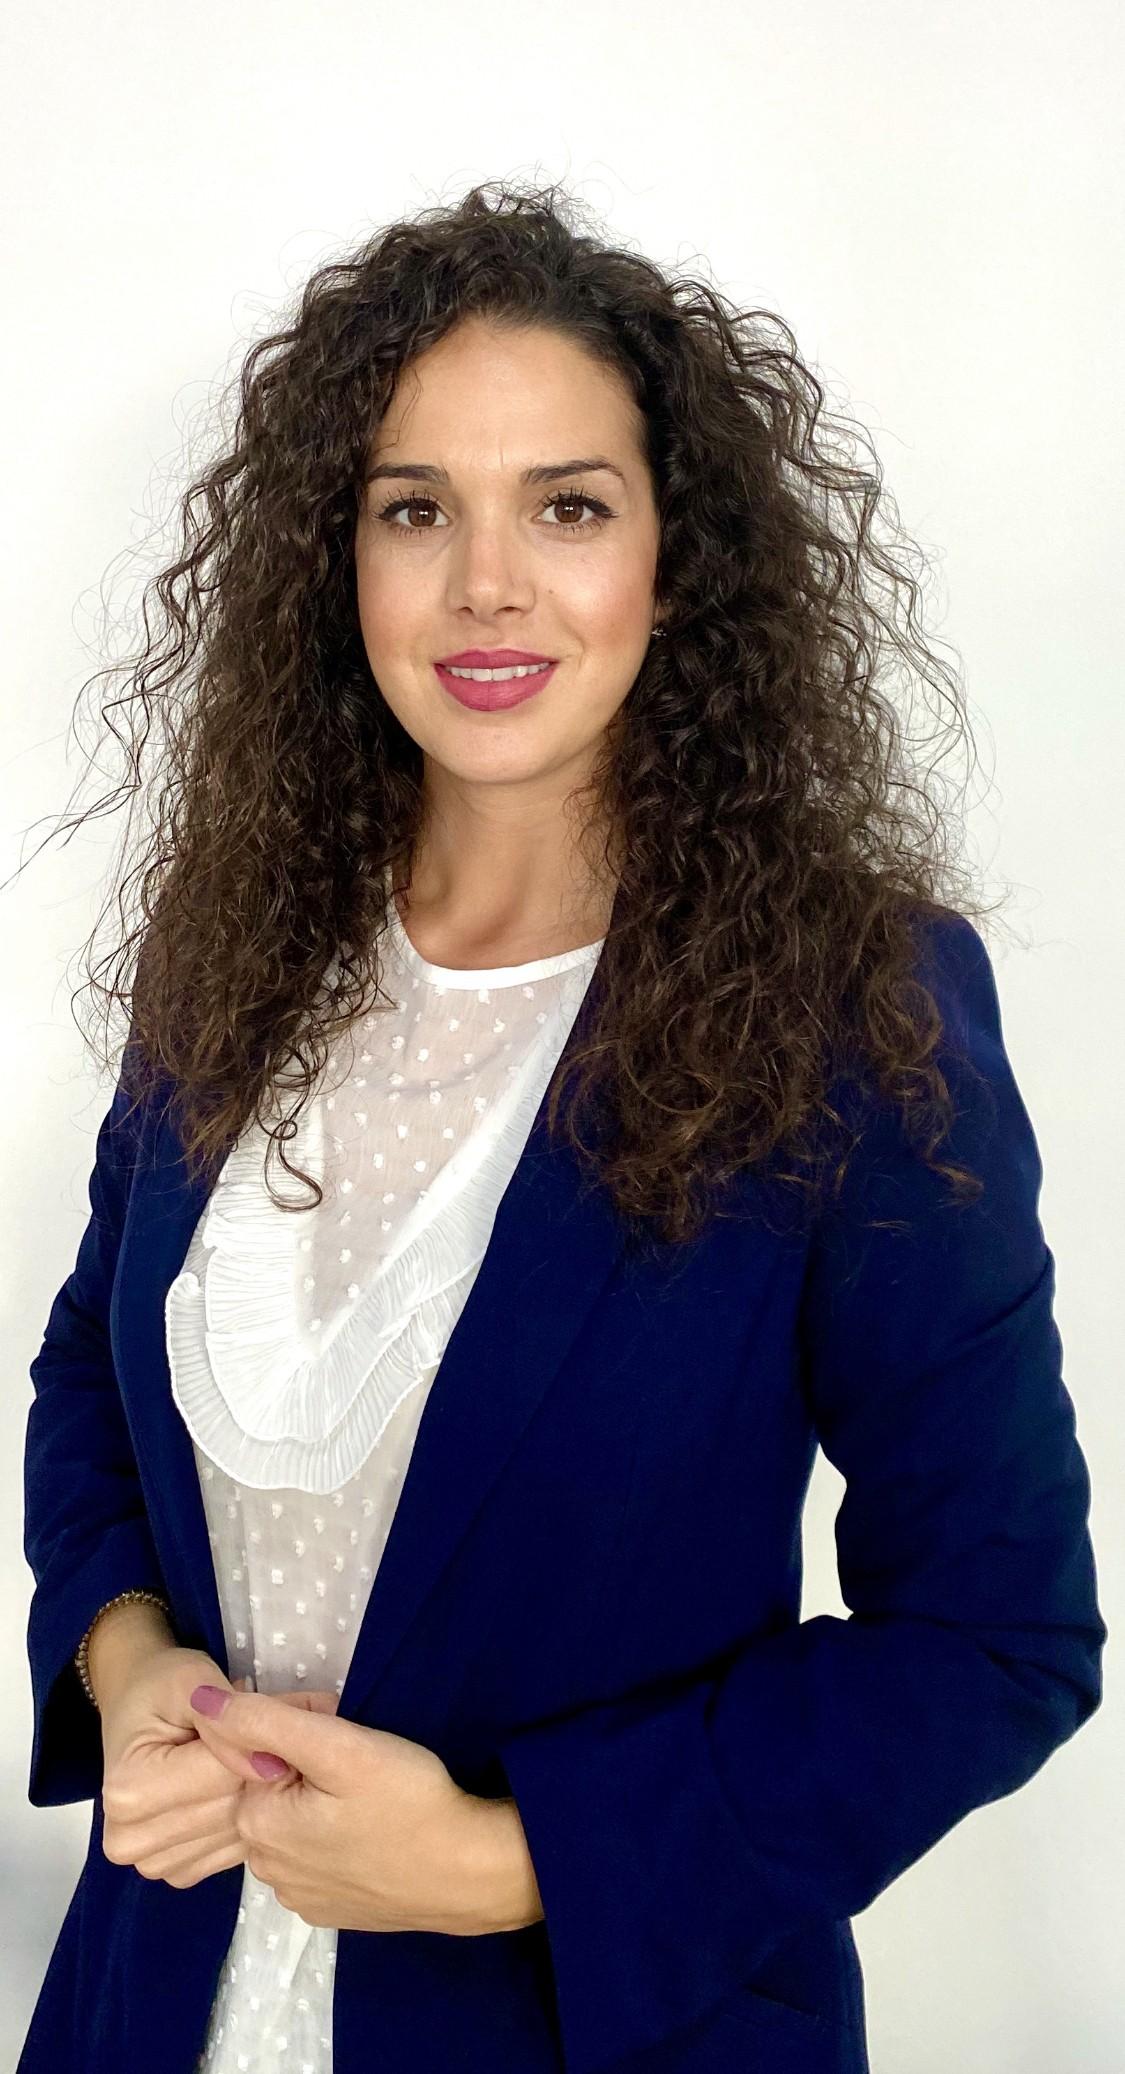 Ana Sabio Rodríguez